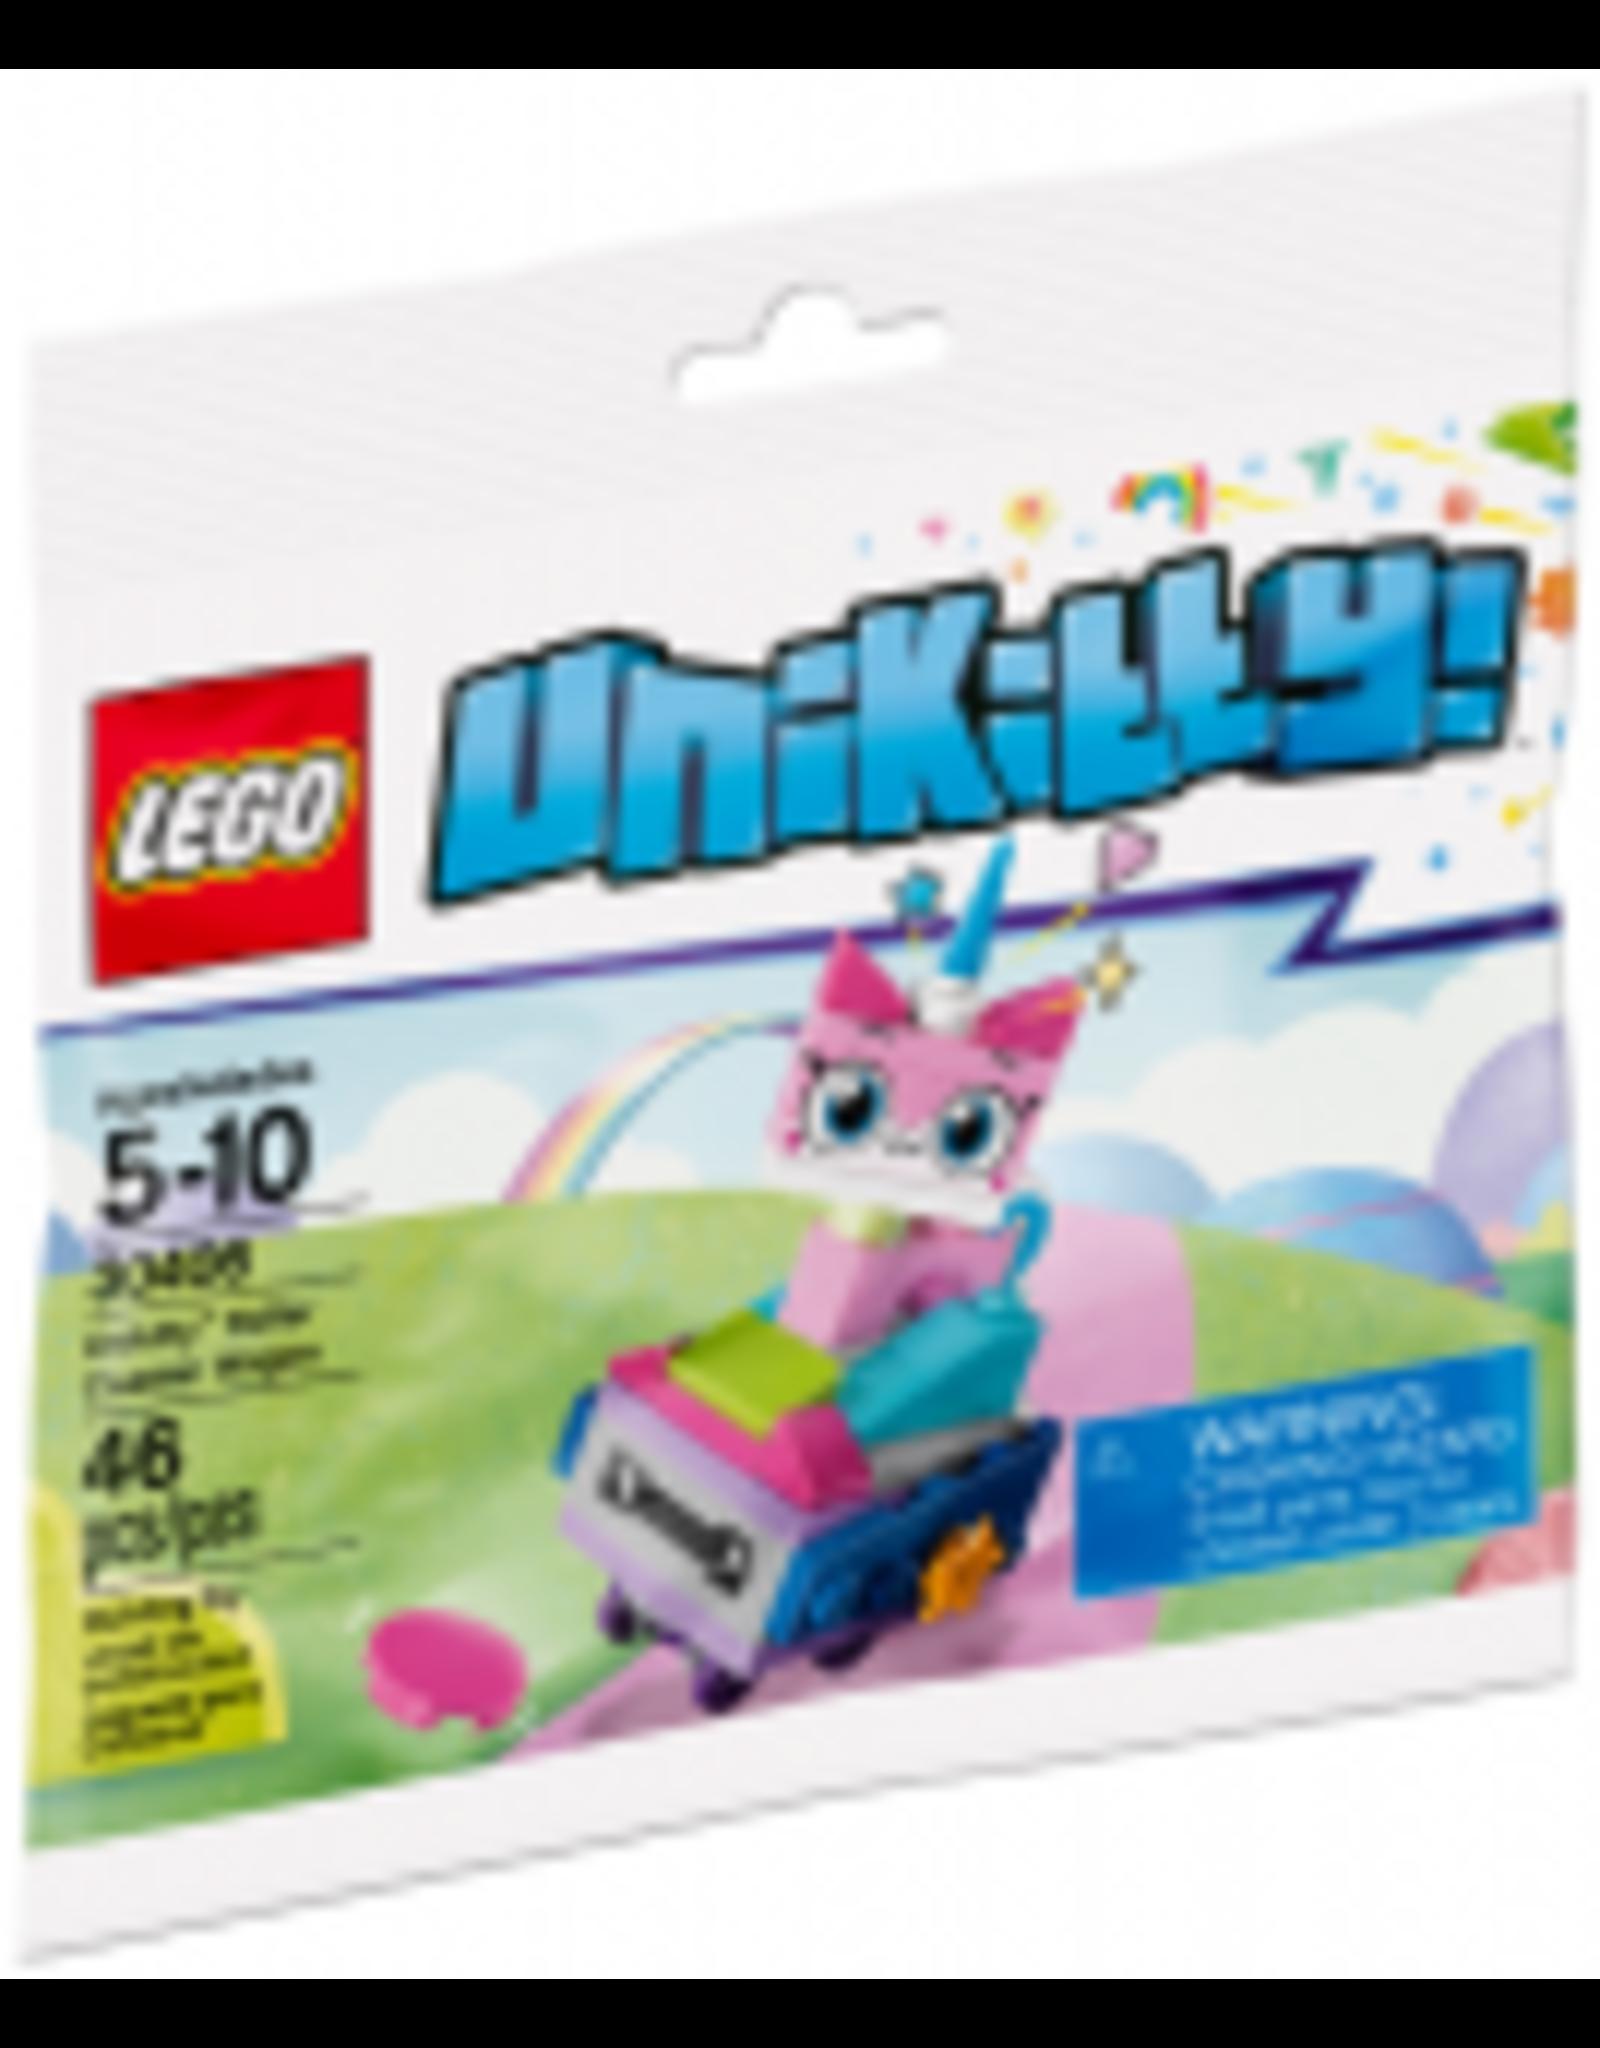 LEGO LEGO 30406 Unikitty Roller Coaster Wagon (Polybag)